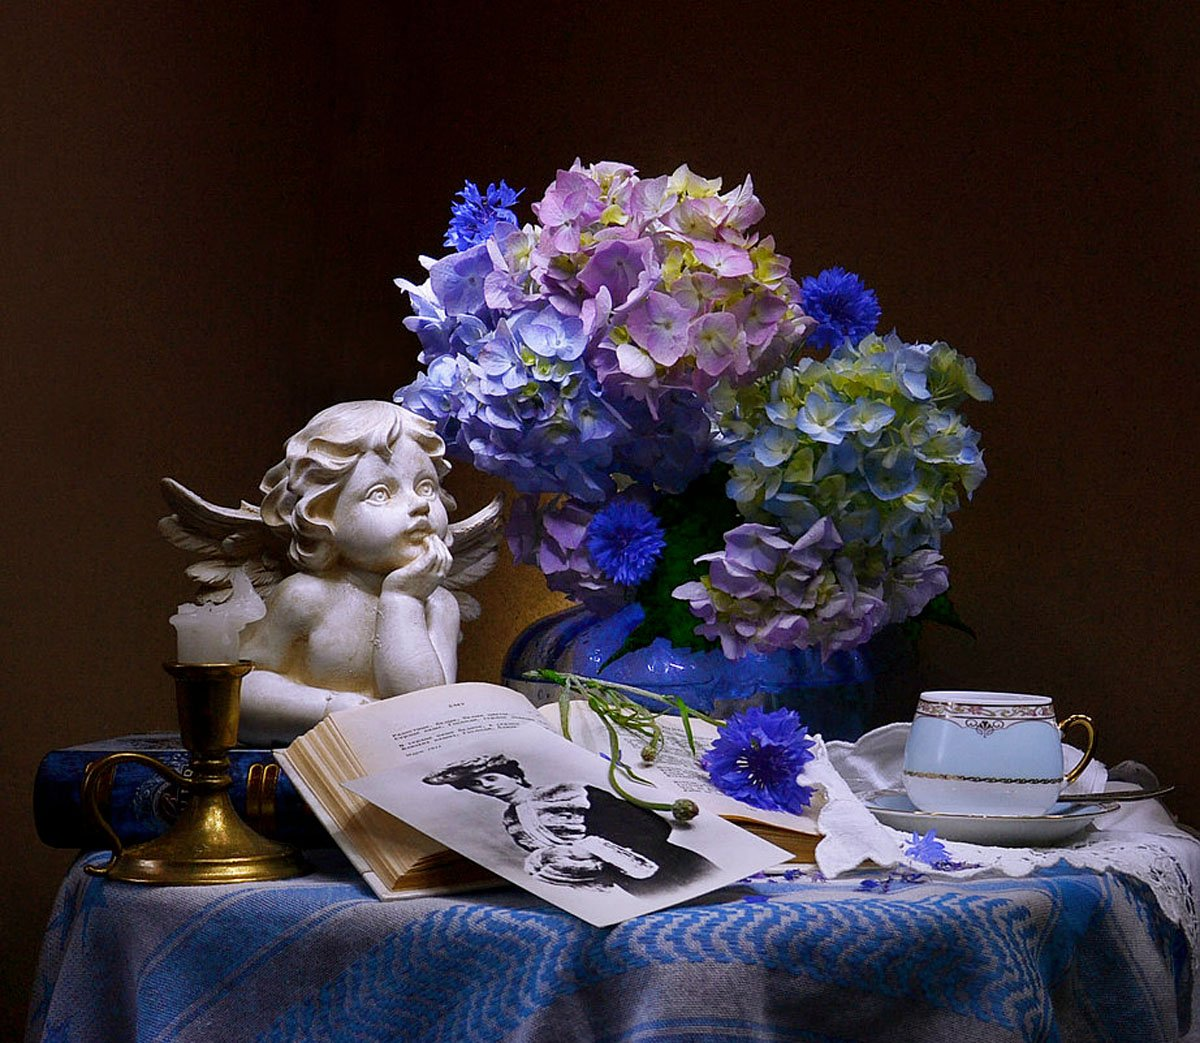 still life, натюрморт, фото натюрморт, гортензия, цветы, букет, свеча, подсвечник, томик стихов, фото, ретро,, Колова Валентина